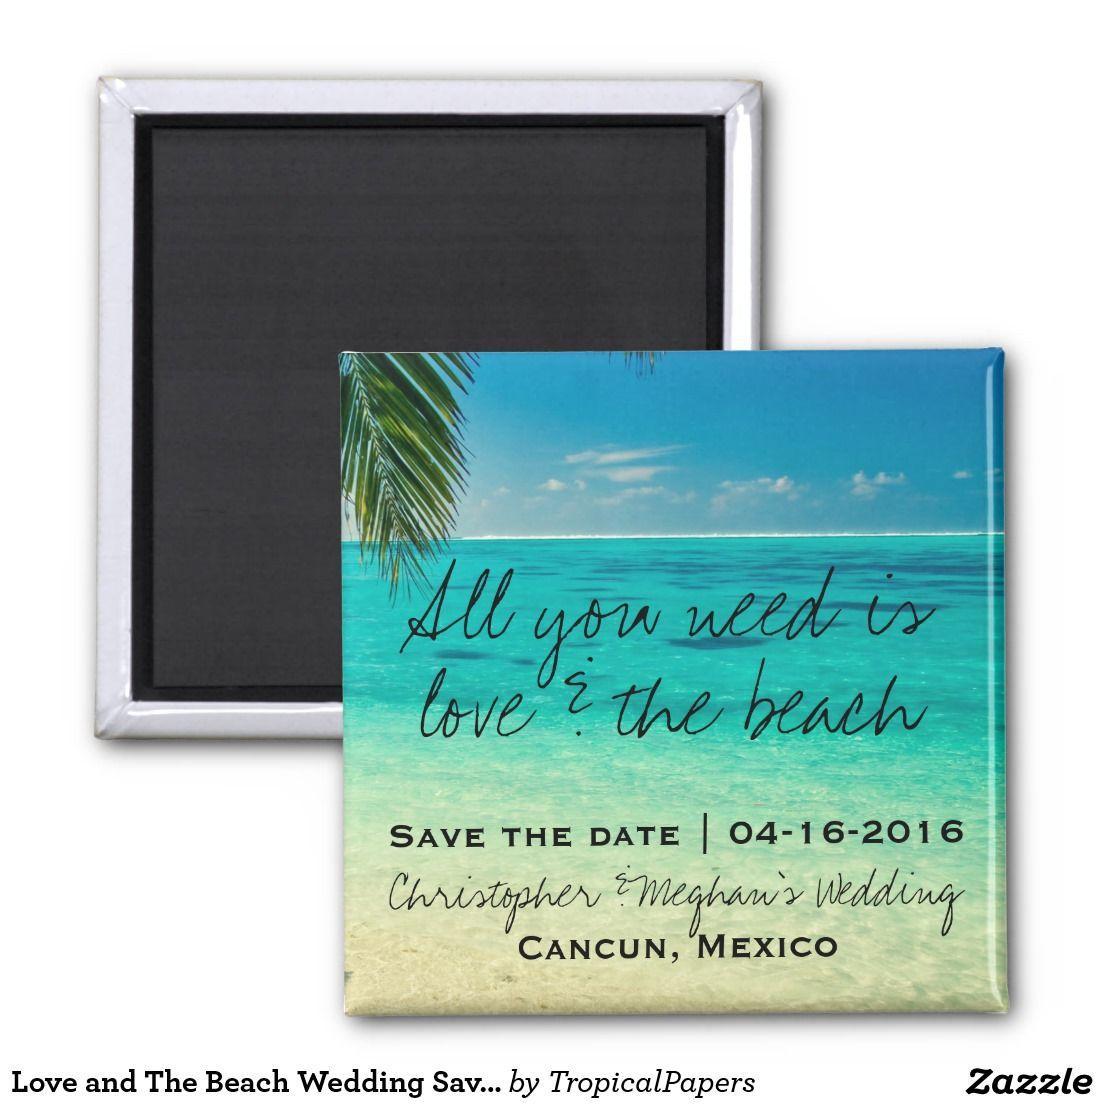 Teal beach wedding  Love and The Beach Wedding Save Date Magnets  Beach weddings